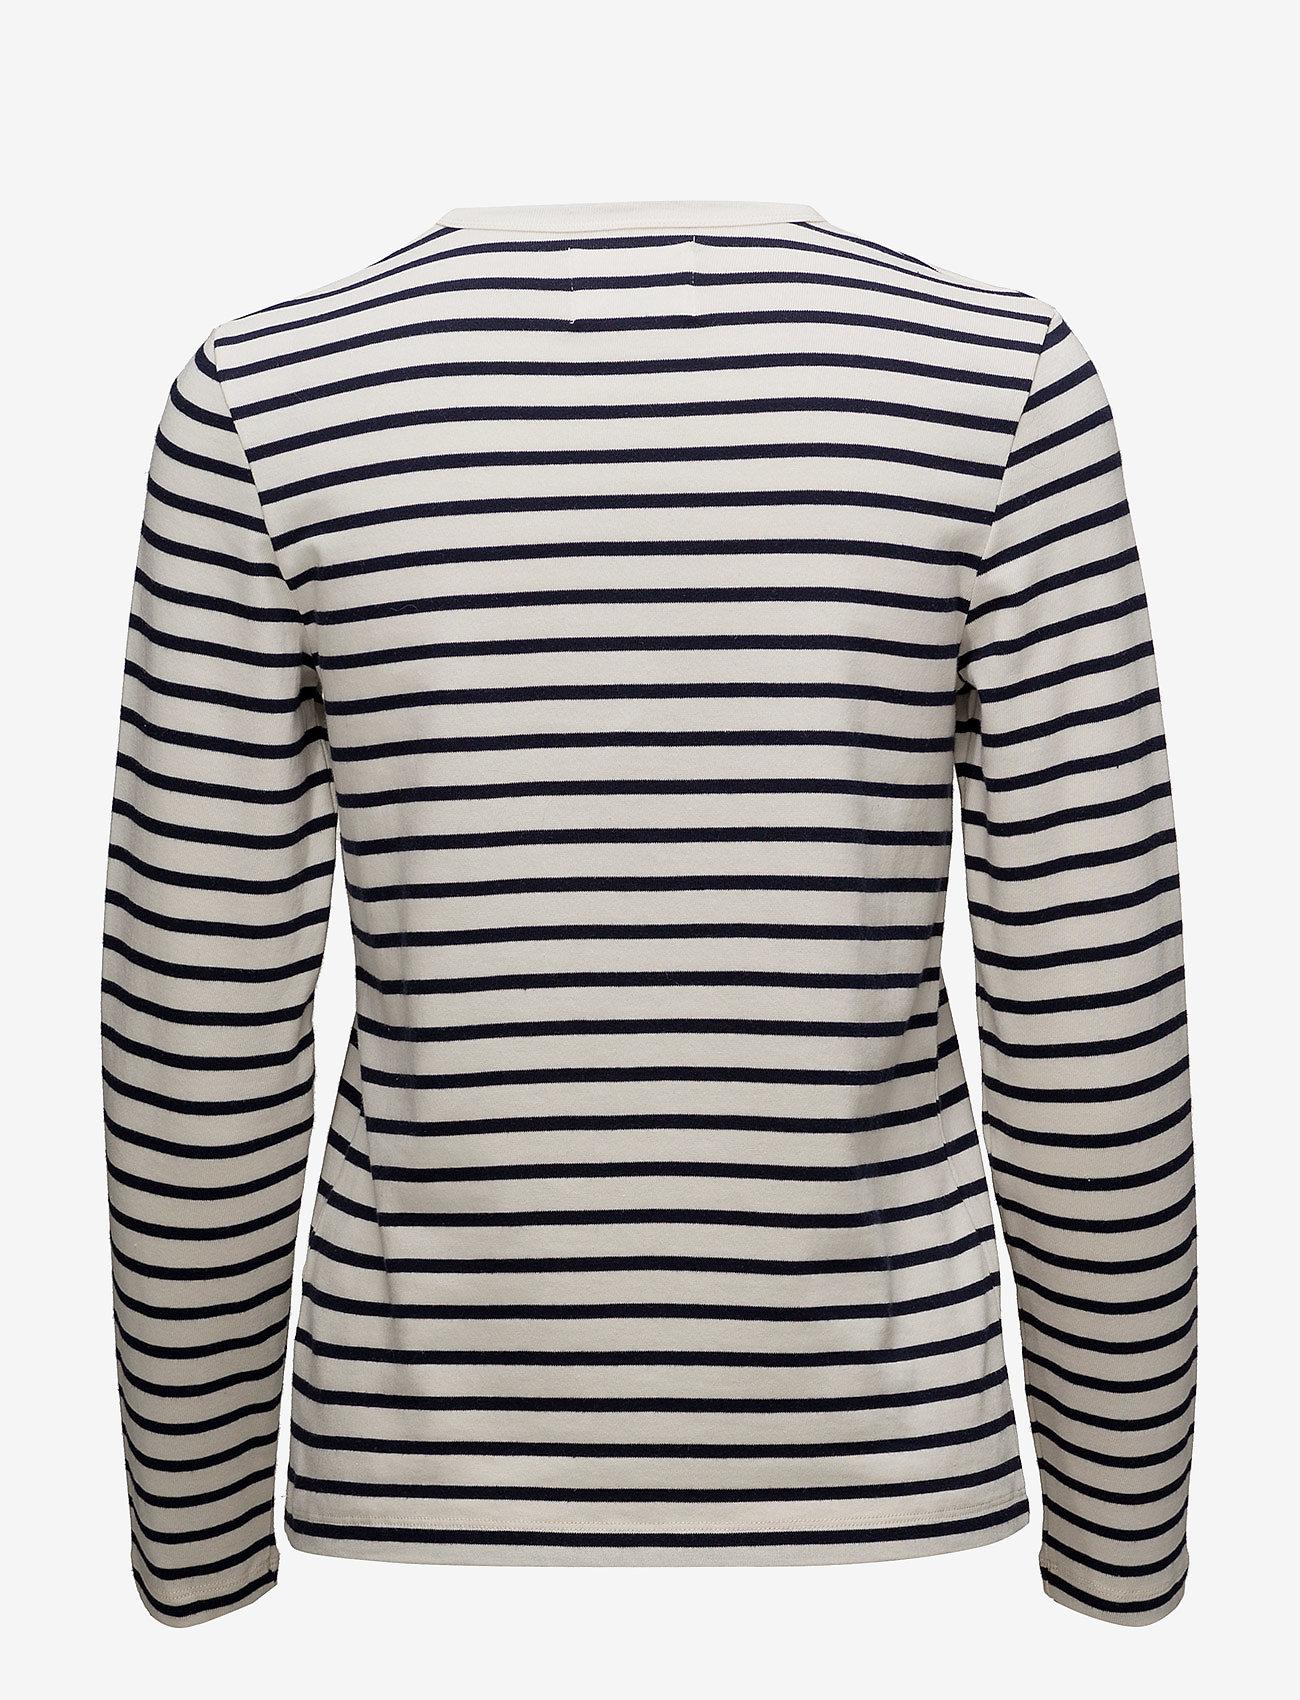 Wood Wood - Moa long sleeve - langærmede toppe - off-white/navy stripes - 1